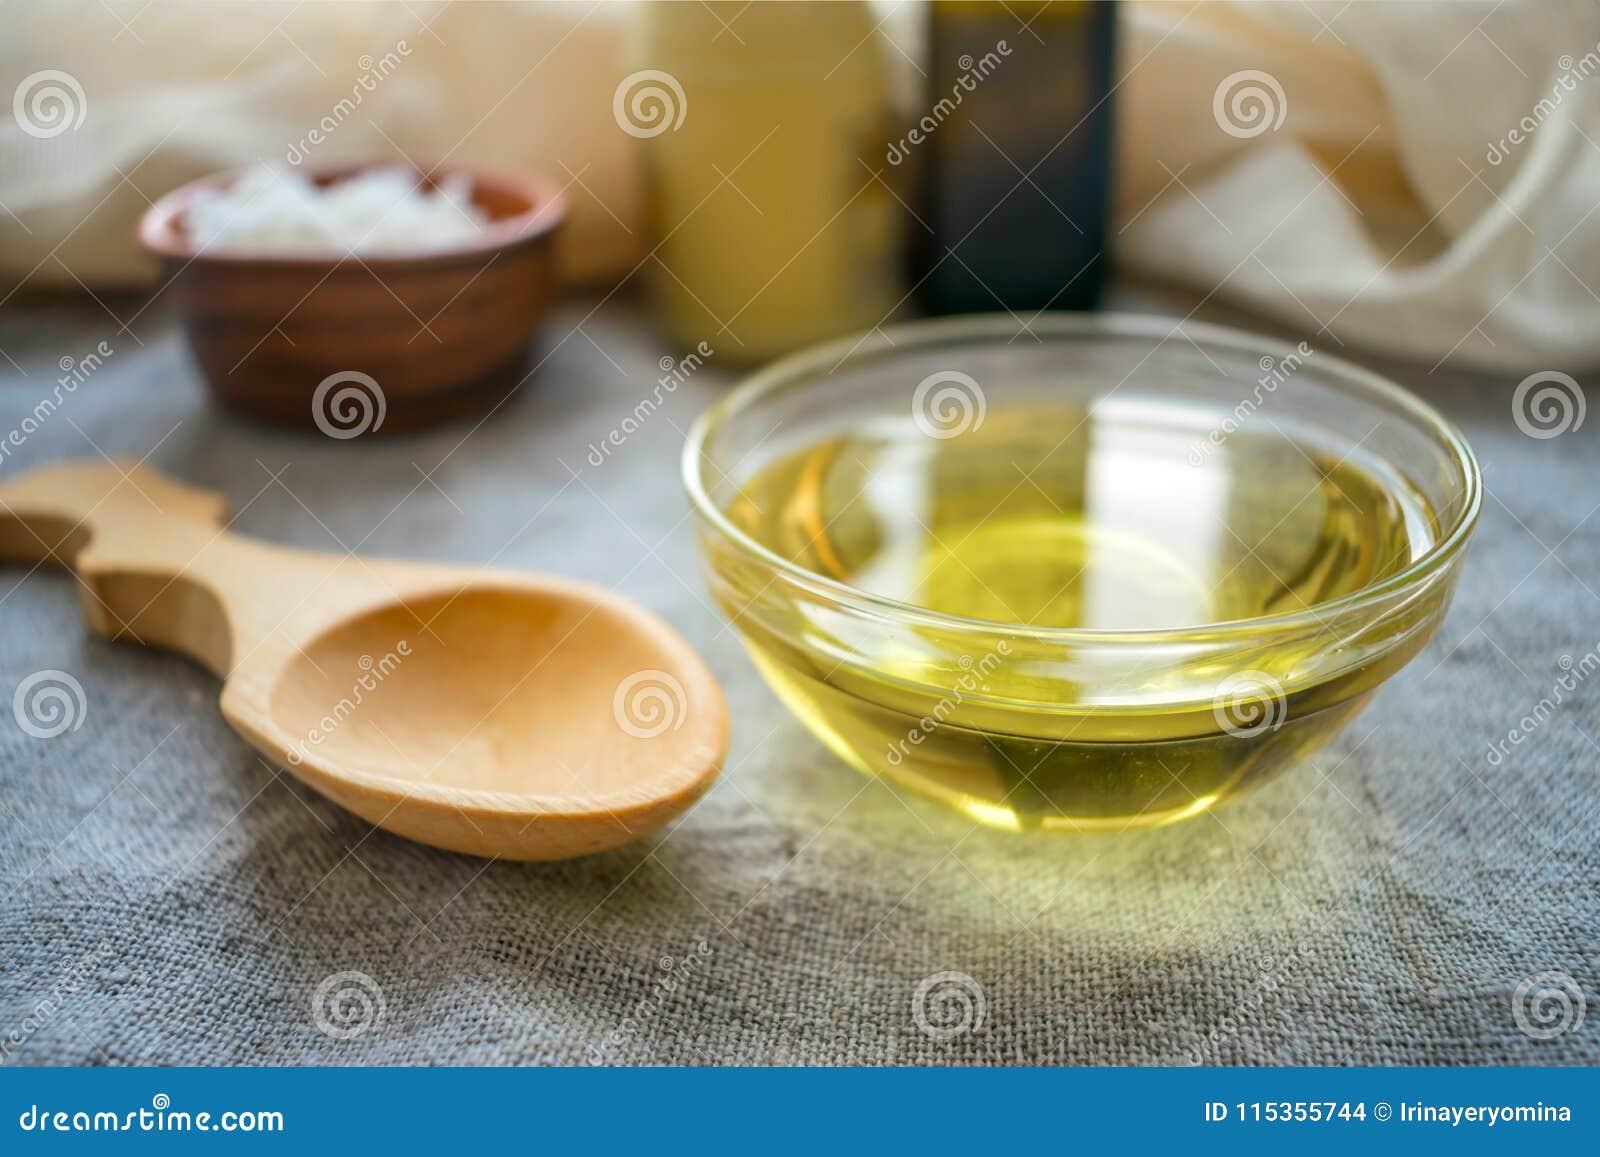 Vloeibare kokosnotenmct olie in ronde glaskom met houten lepel en